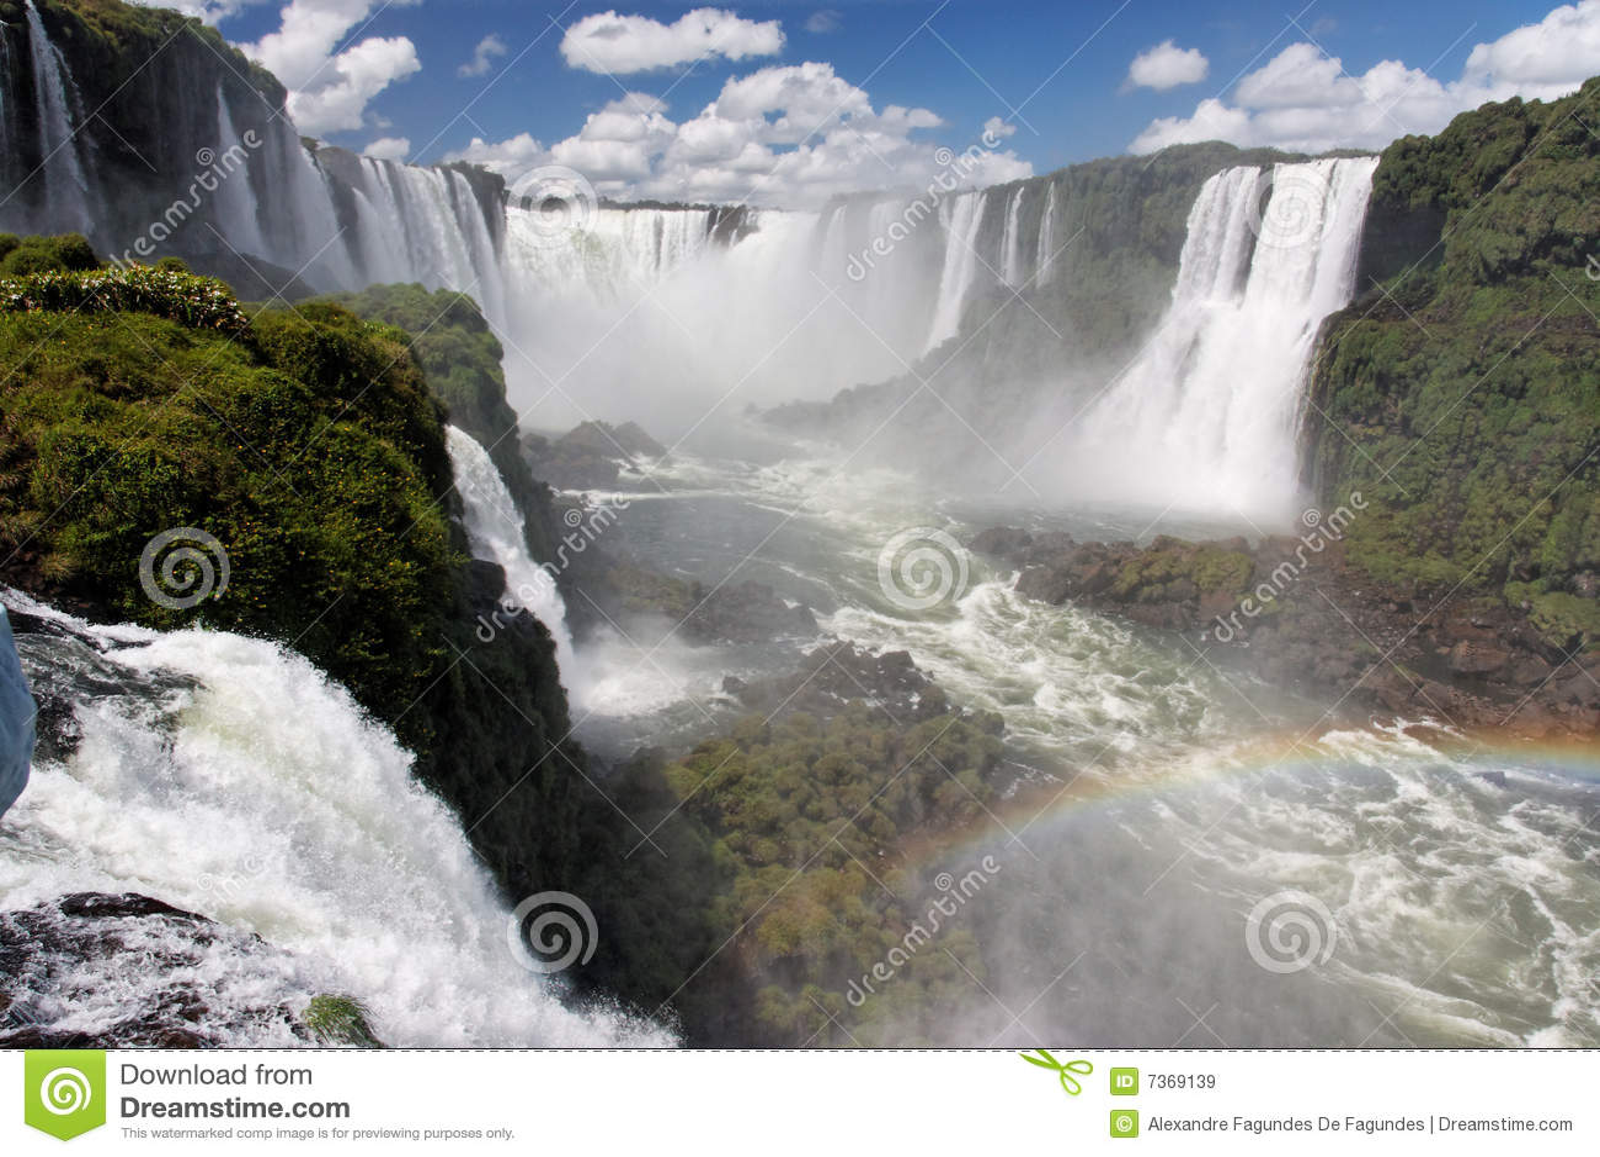 Foz fa le cadute Argentina Brasile di Iguassu